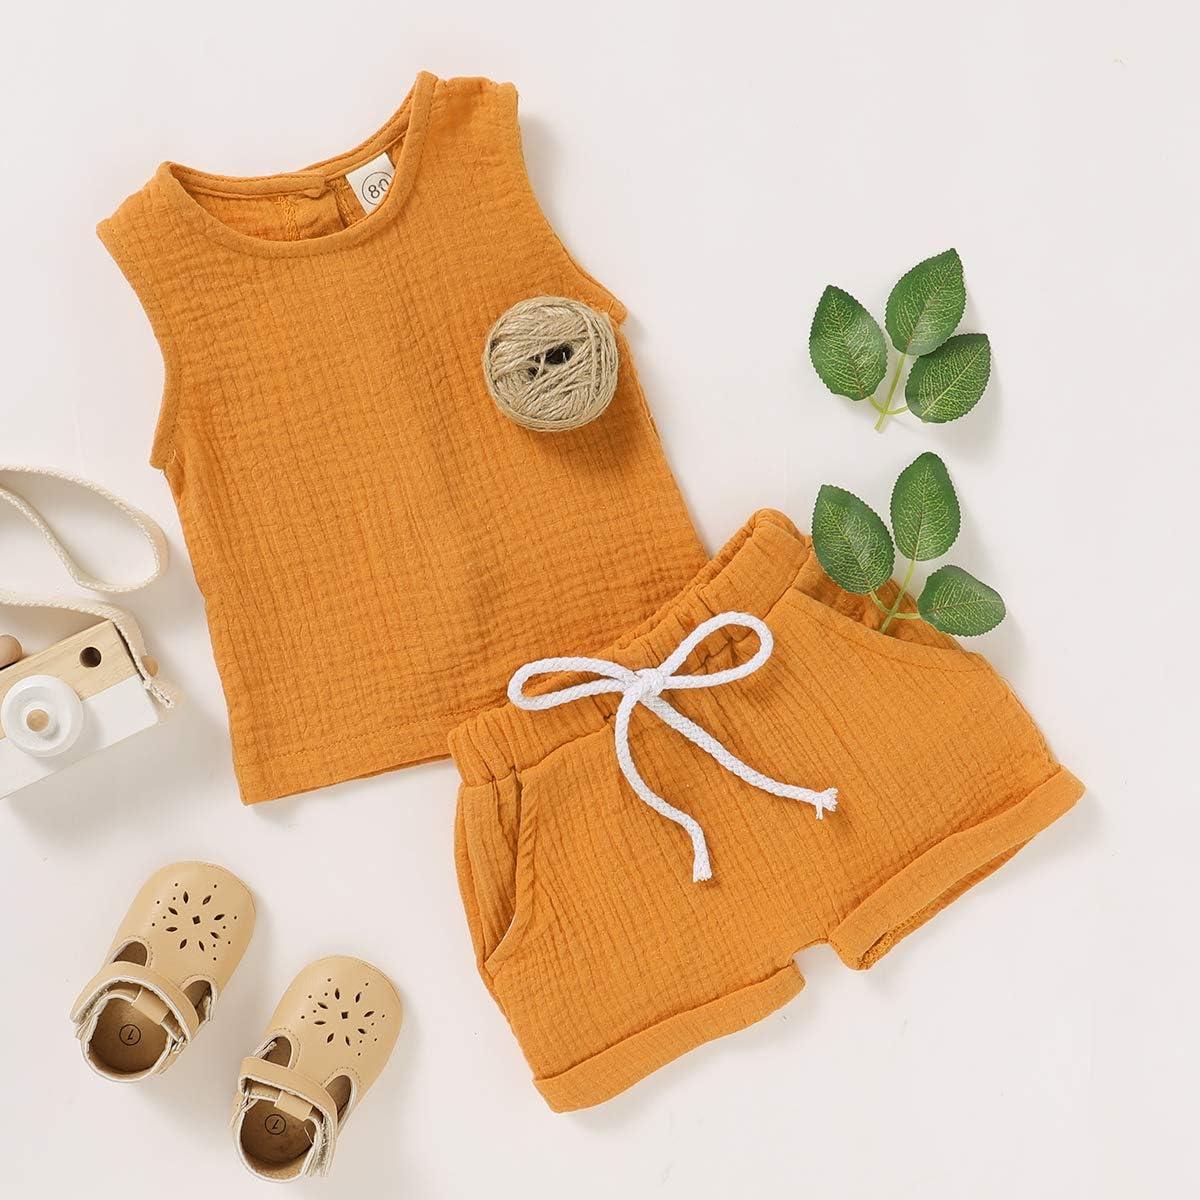 GRNSHTS Infant Baby Boys Girls Summer Shorts Set Unisex Linen Tank Top+Solid Color Short Pants 2Pcs Clothes